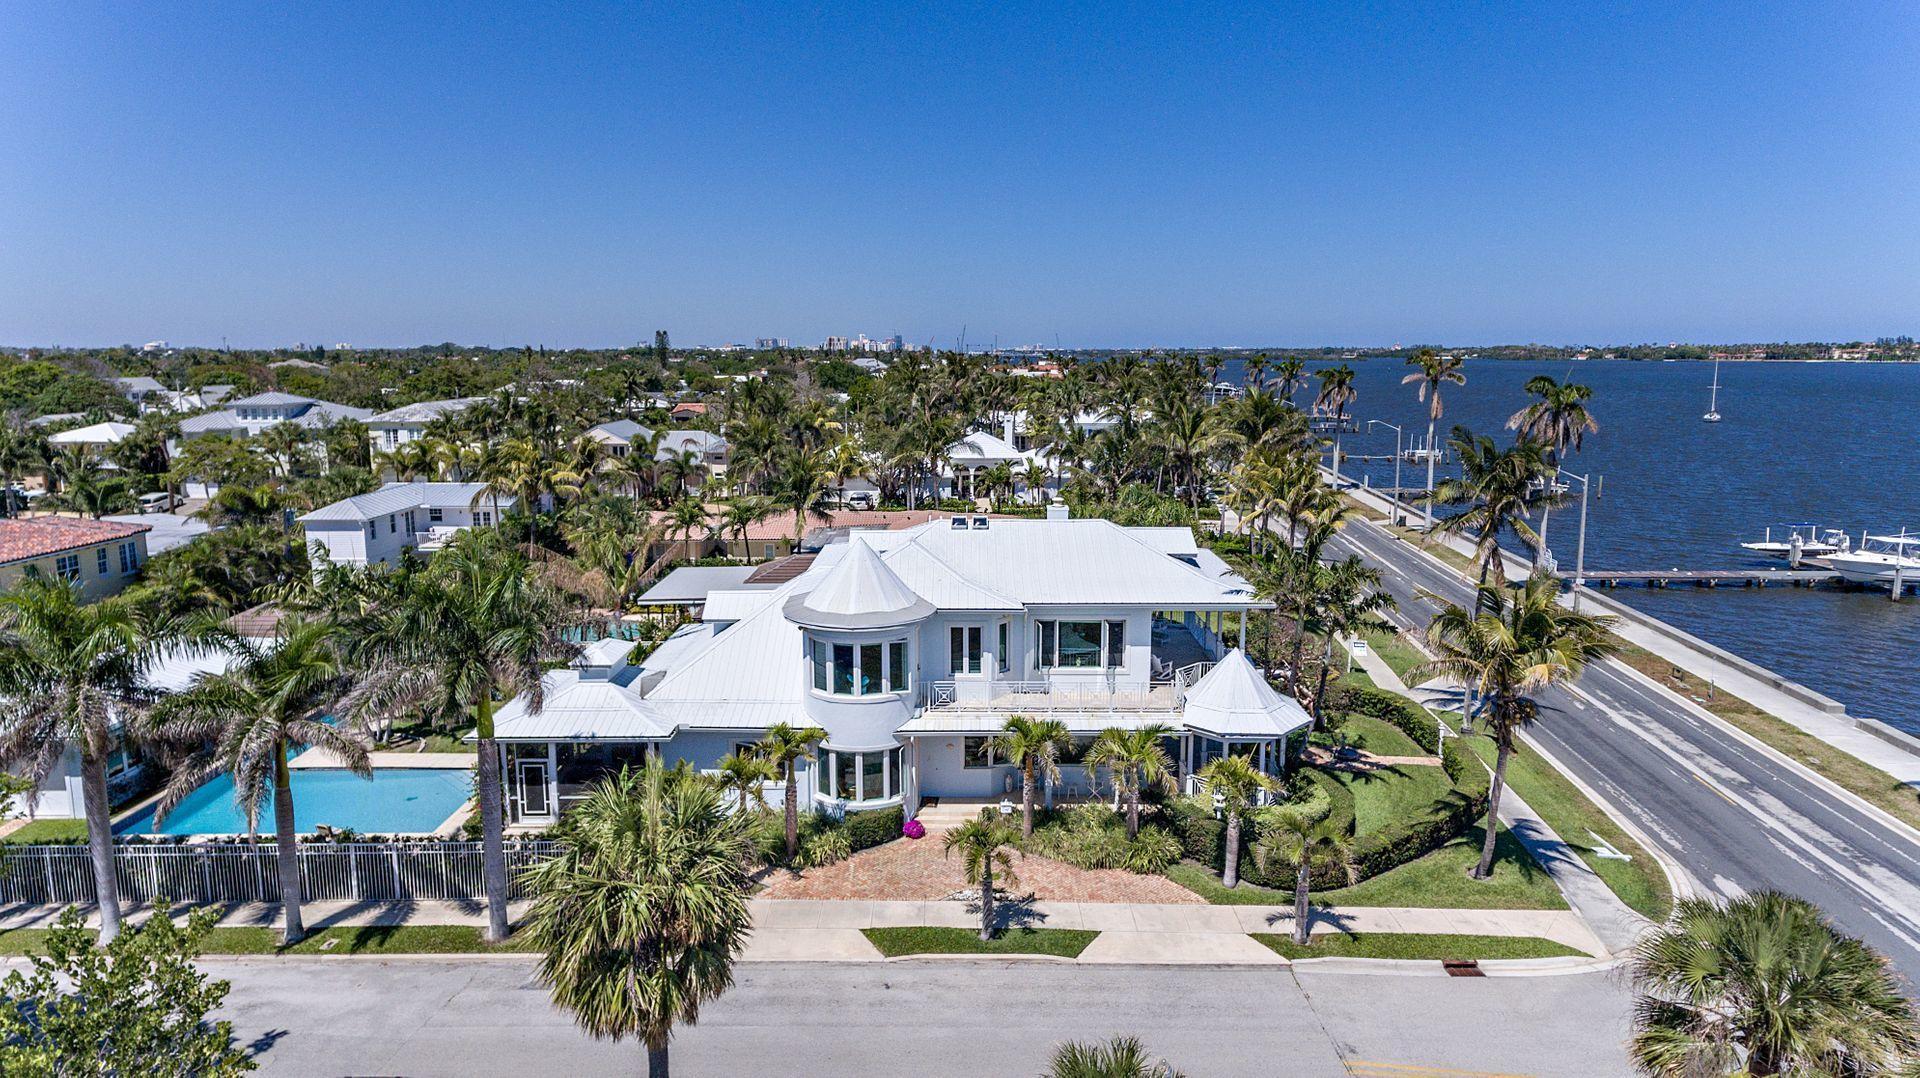 6917 Flagler Drive, West Palm Beach, Florida 33405, 4 Bedrooms Bedrooms, ,4.1 BathroomsBathrooms,Single Family,For Sale,Flagler,1,RX-10438826